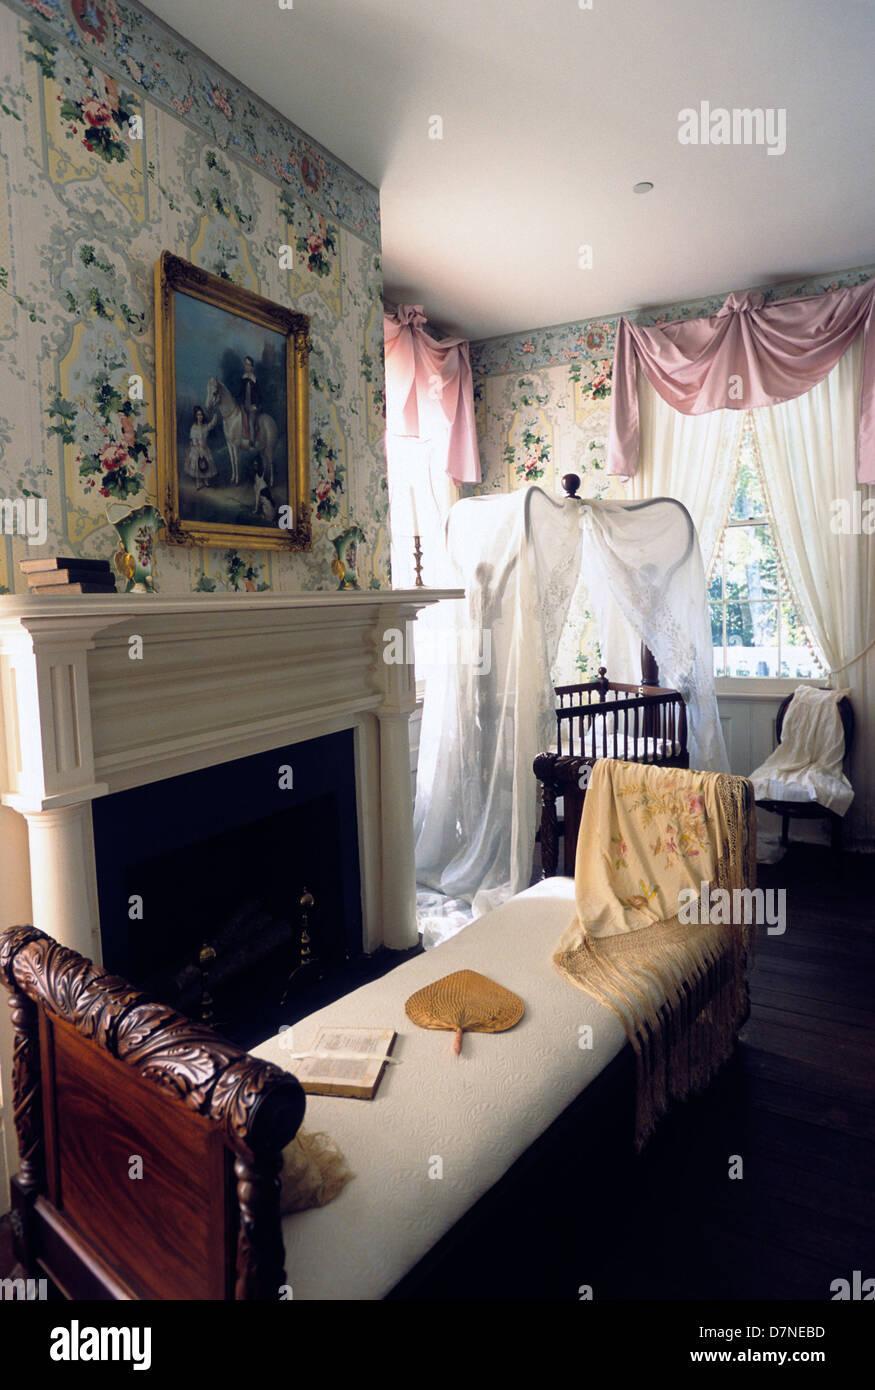 Elk283-3016v Louisiana, St Francisville, Rosedown Plantation State Historic Site, Mansion, 1836, bedroom - Stock Image